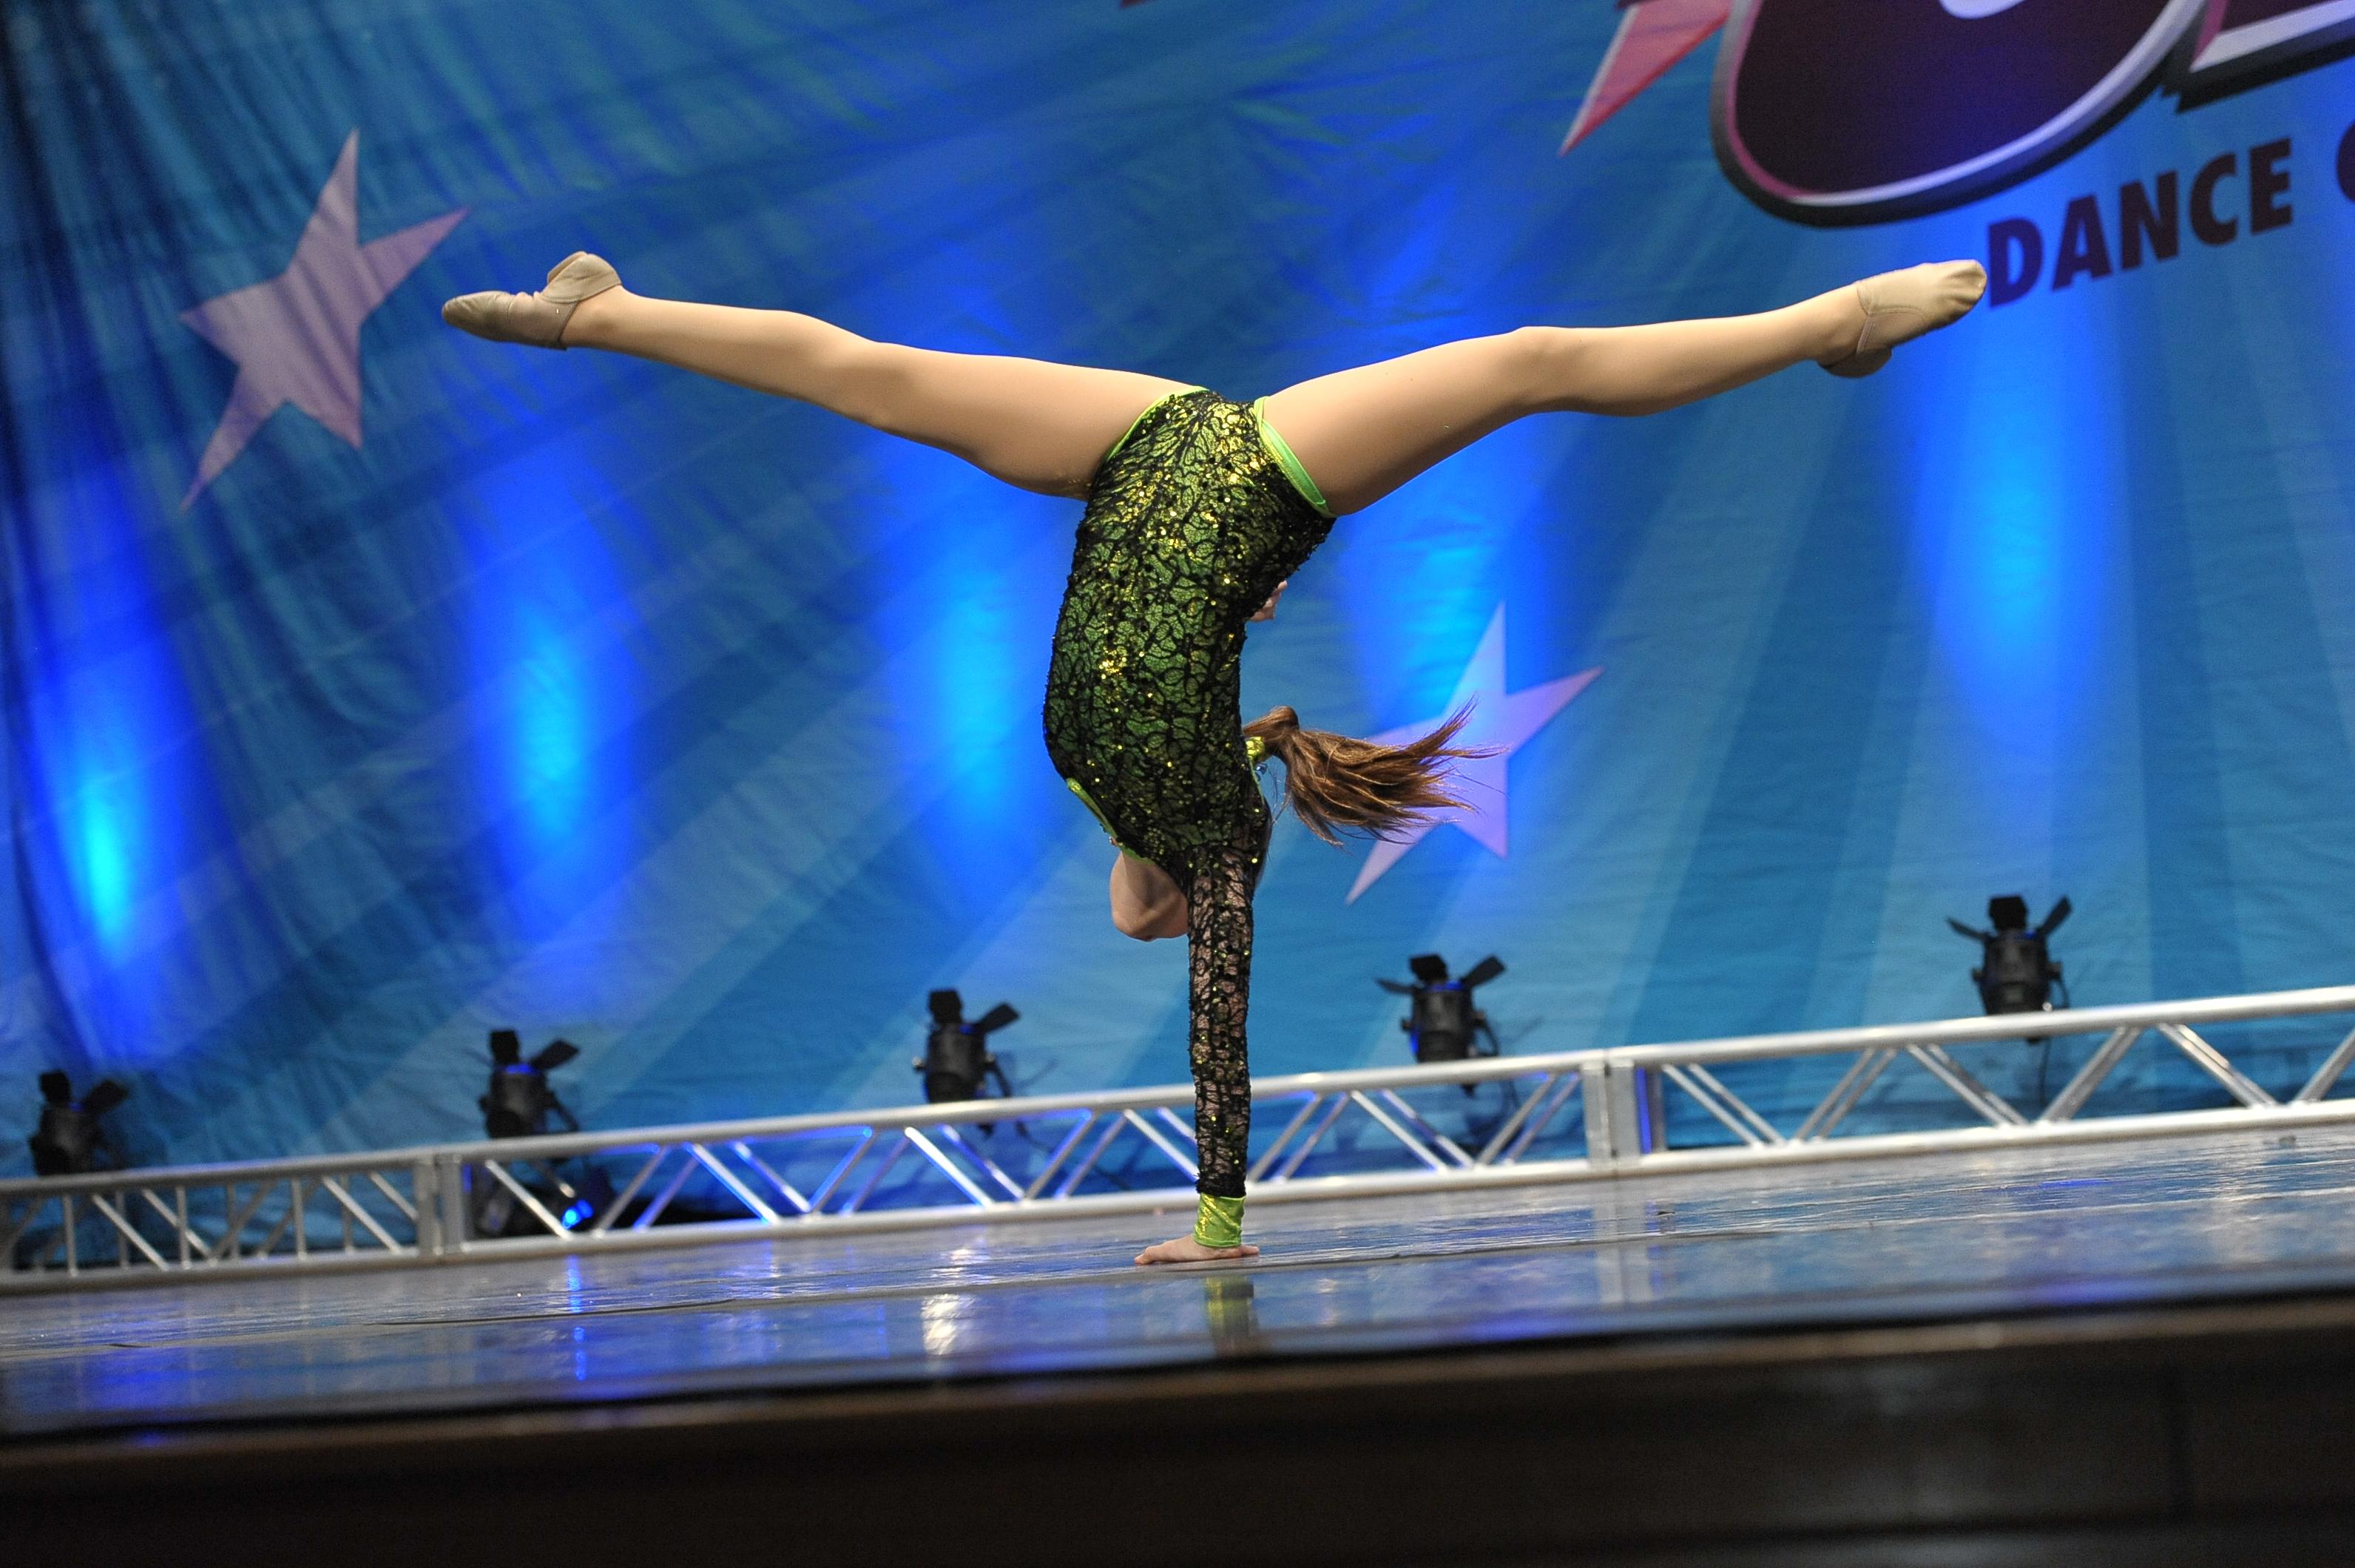 Linx news wellesley ma acrobatic dance certification enhances linx dance programs xflitez Choice Image